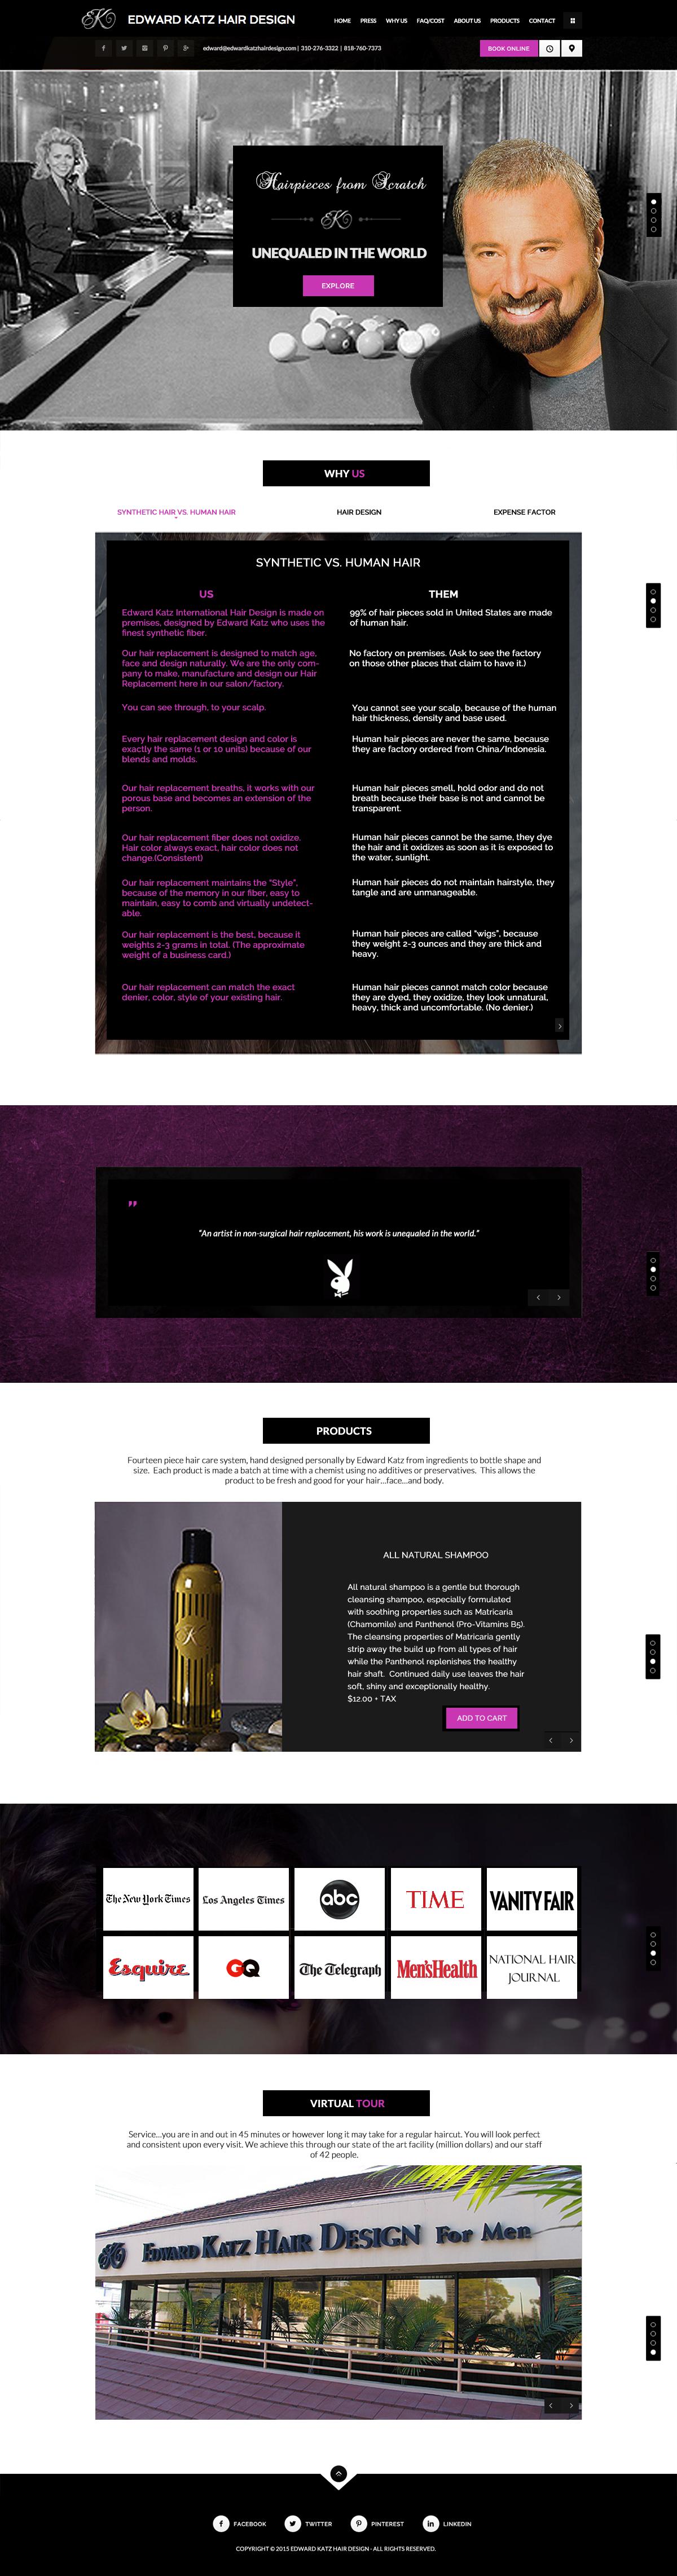 Website Design Company Seo Animation Projects Epikta Web Development Design Digital Marketing Solutions Affordable Website Design